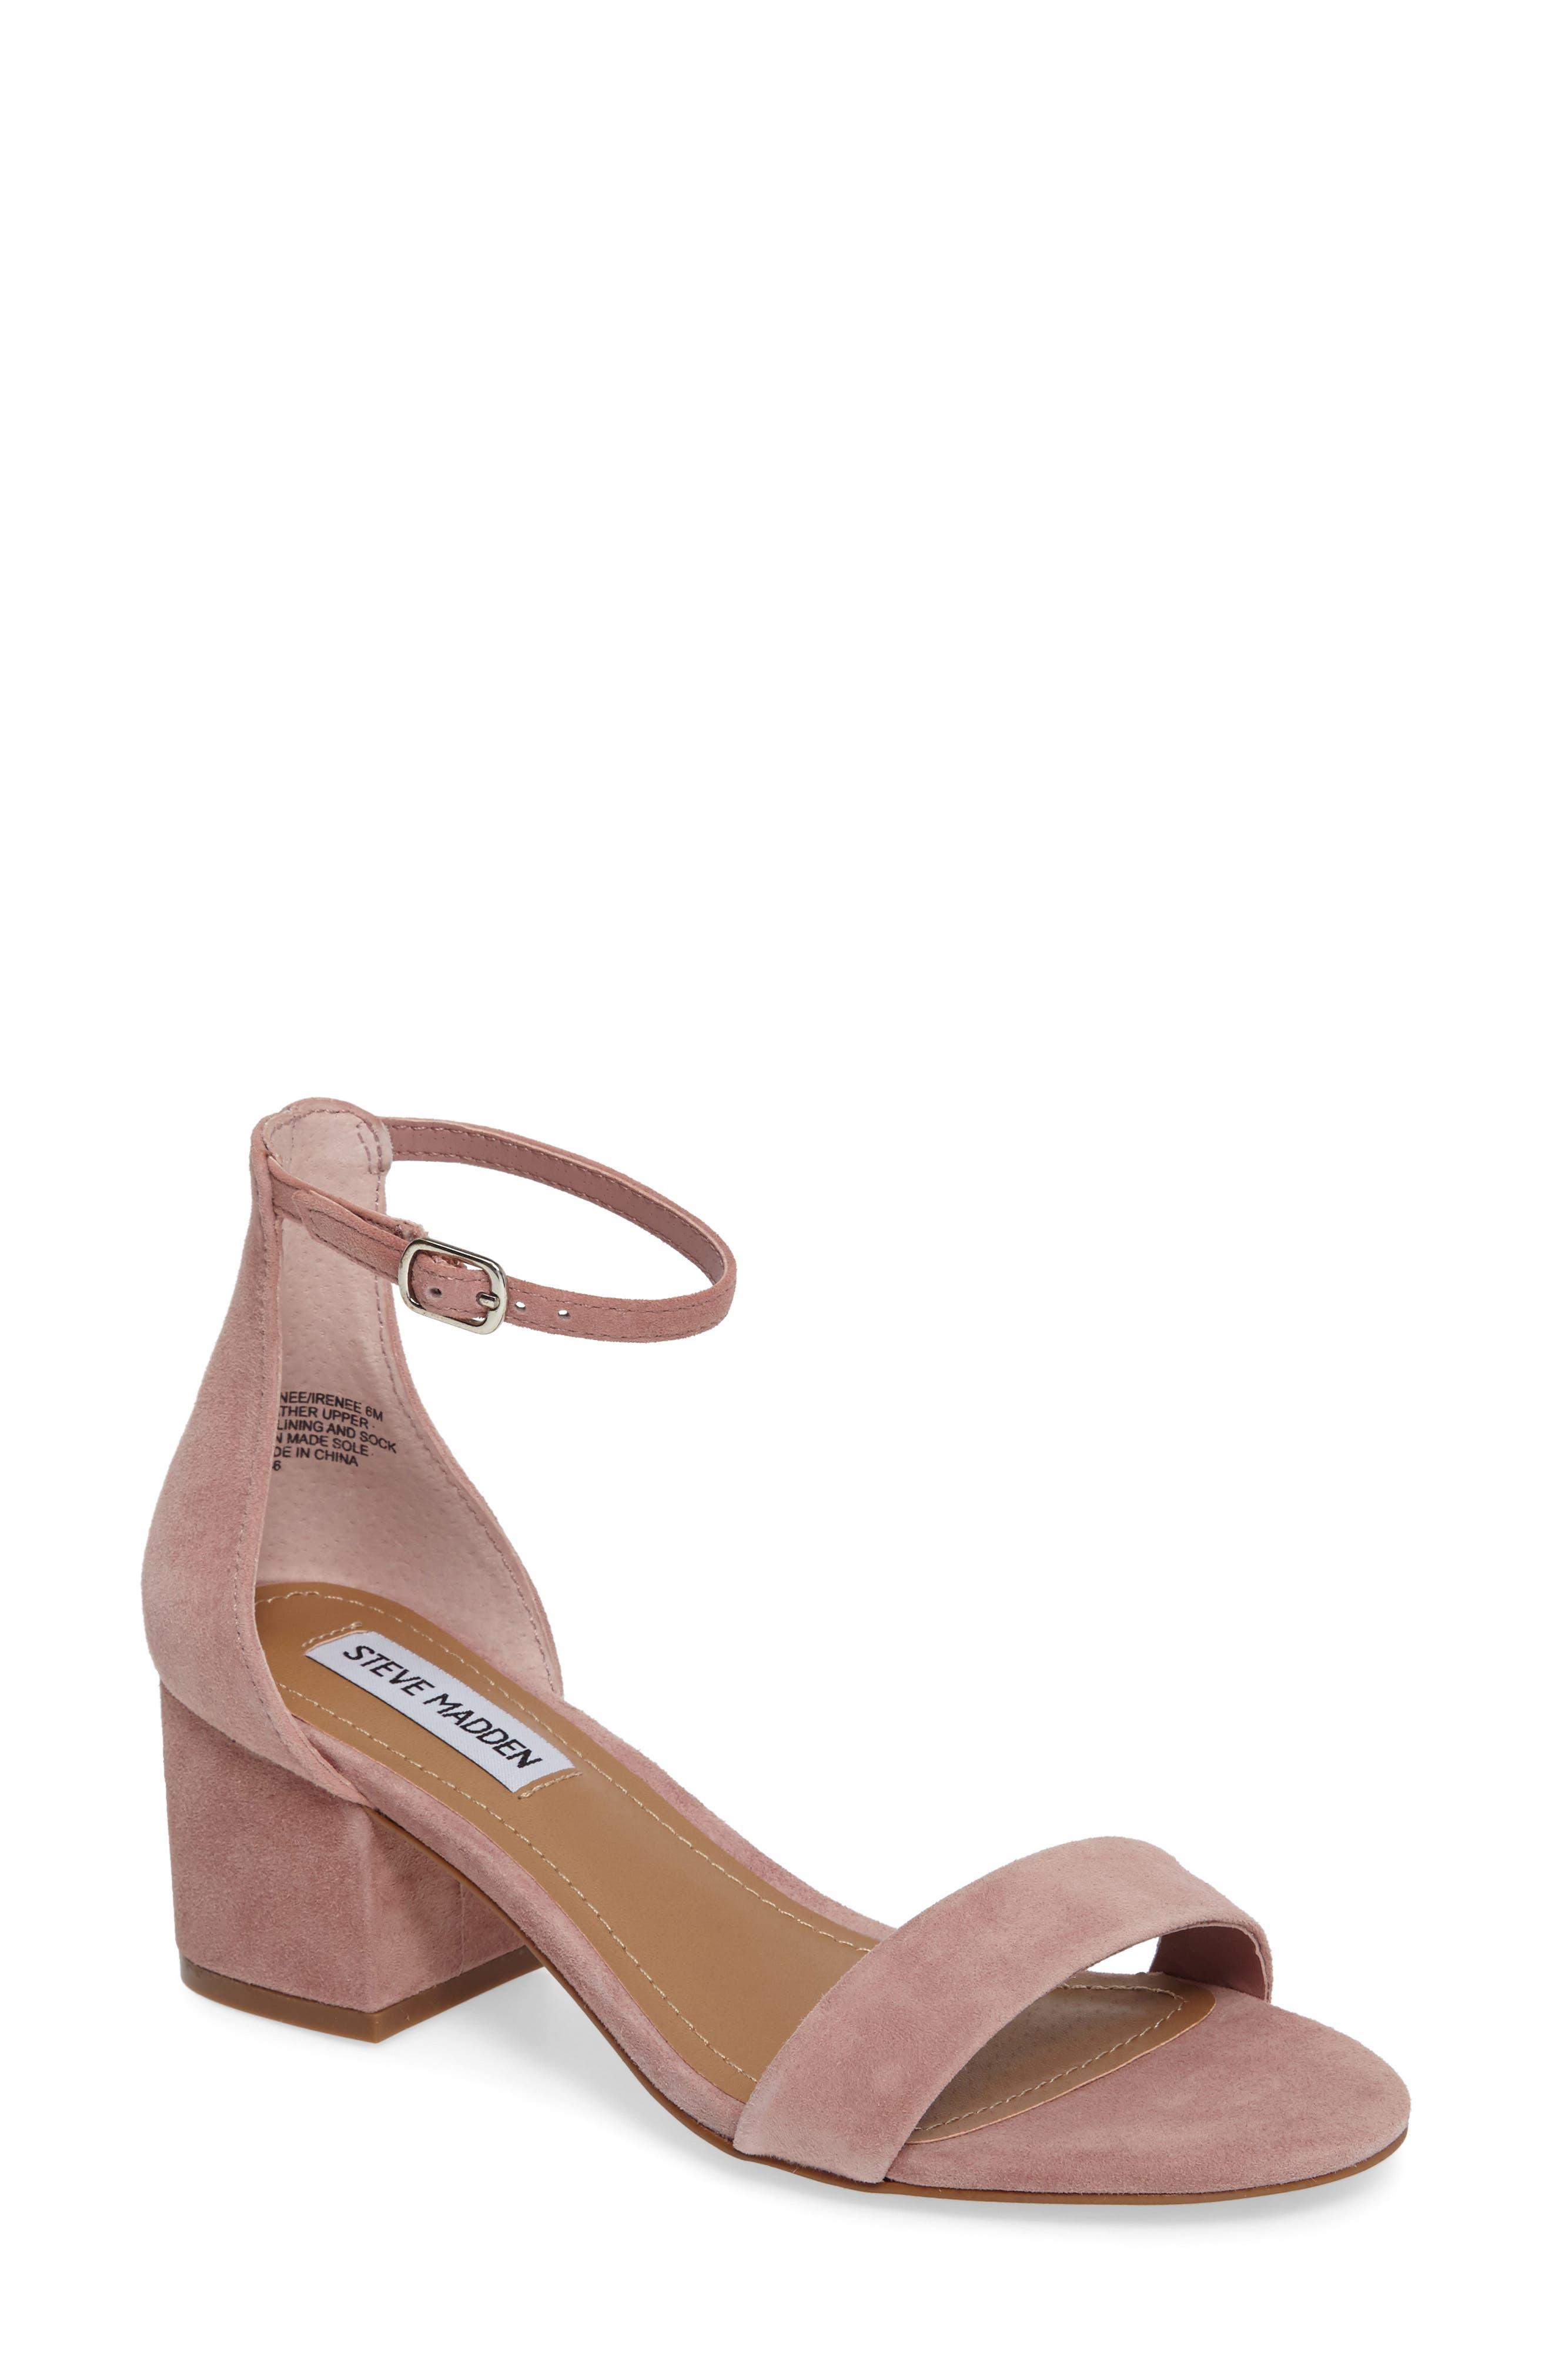 Irenee Ankle Strap Sandal,                             Main thumbnail 9, color,